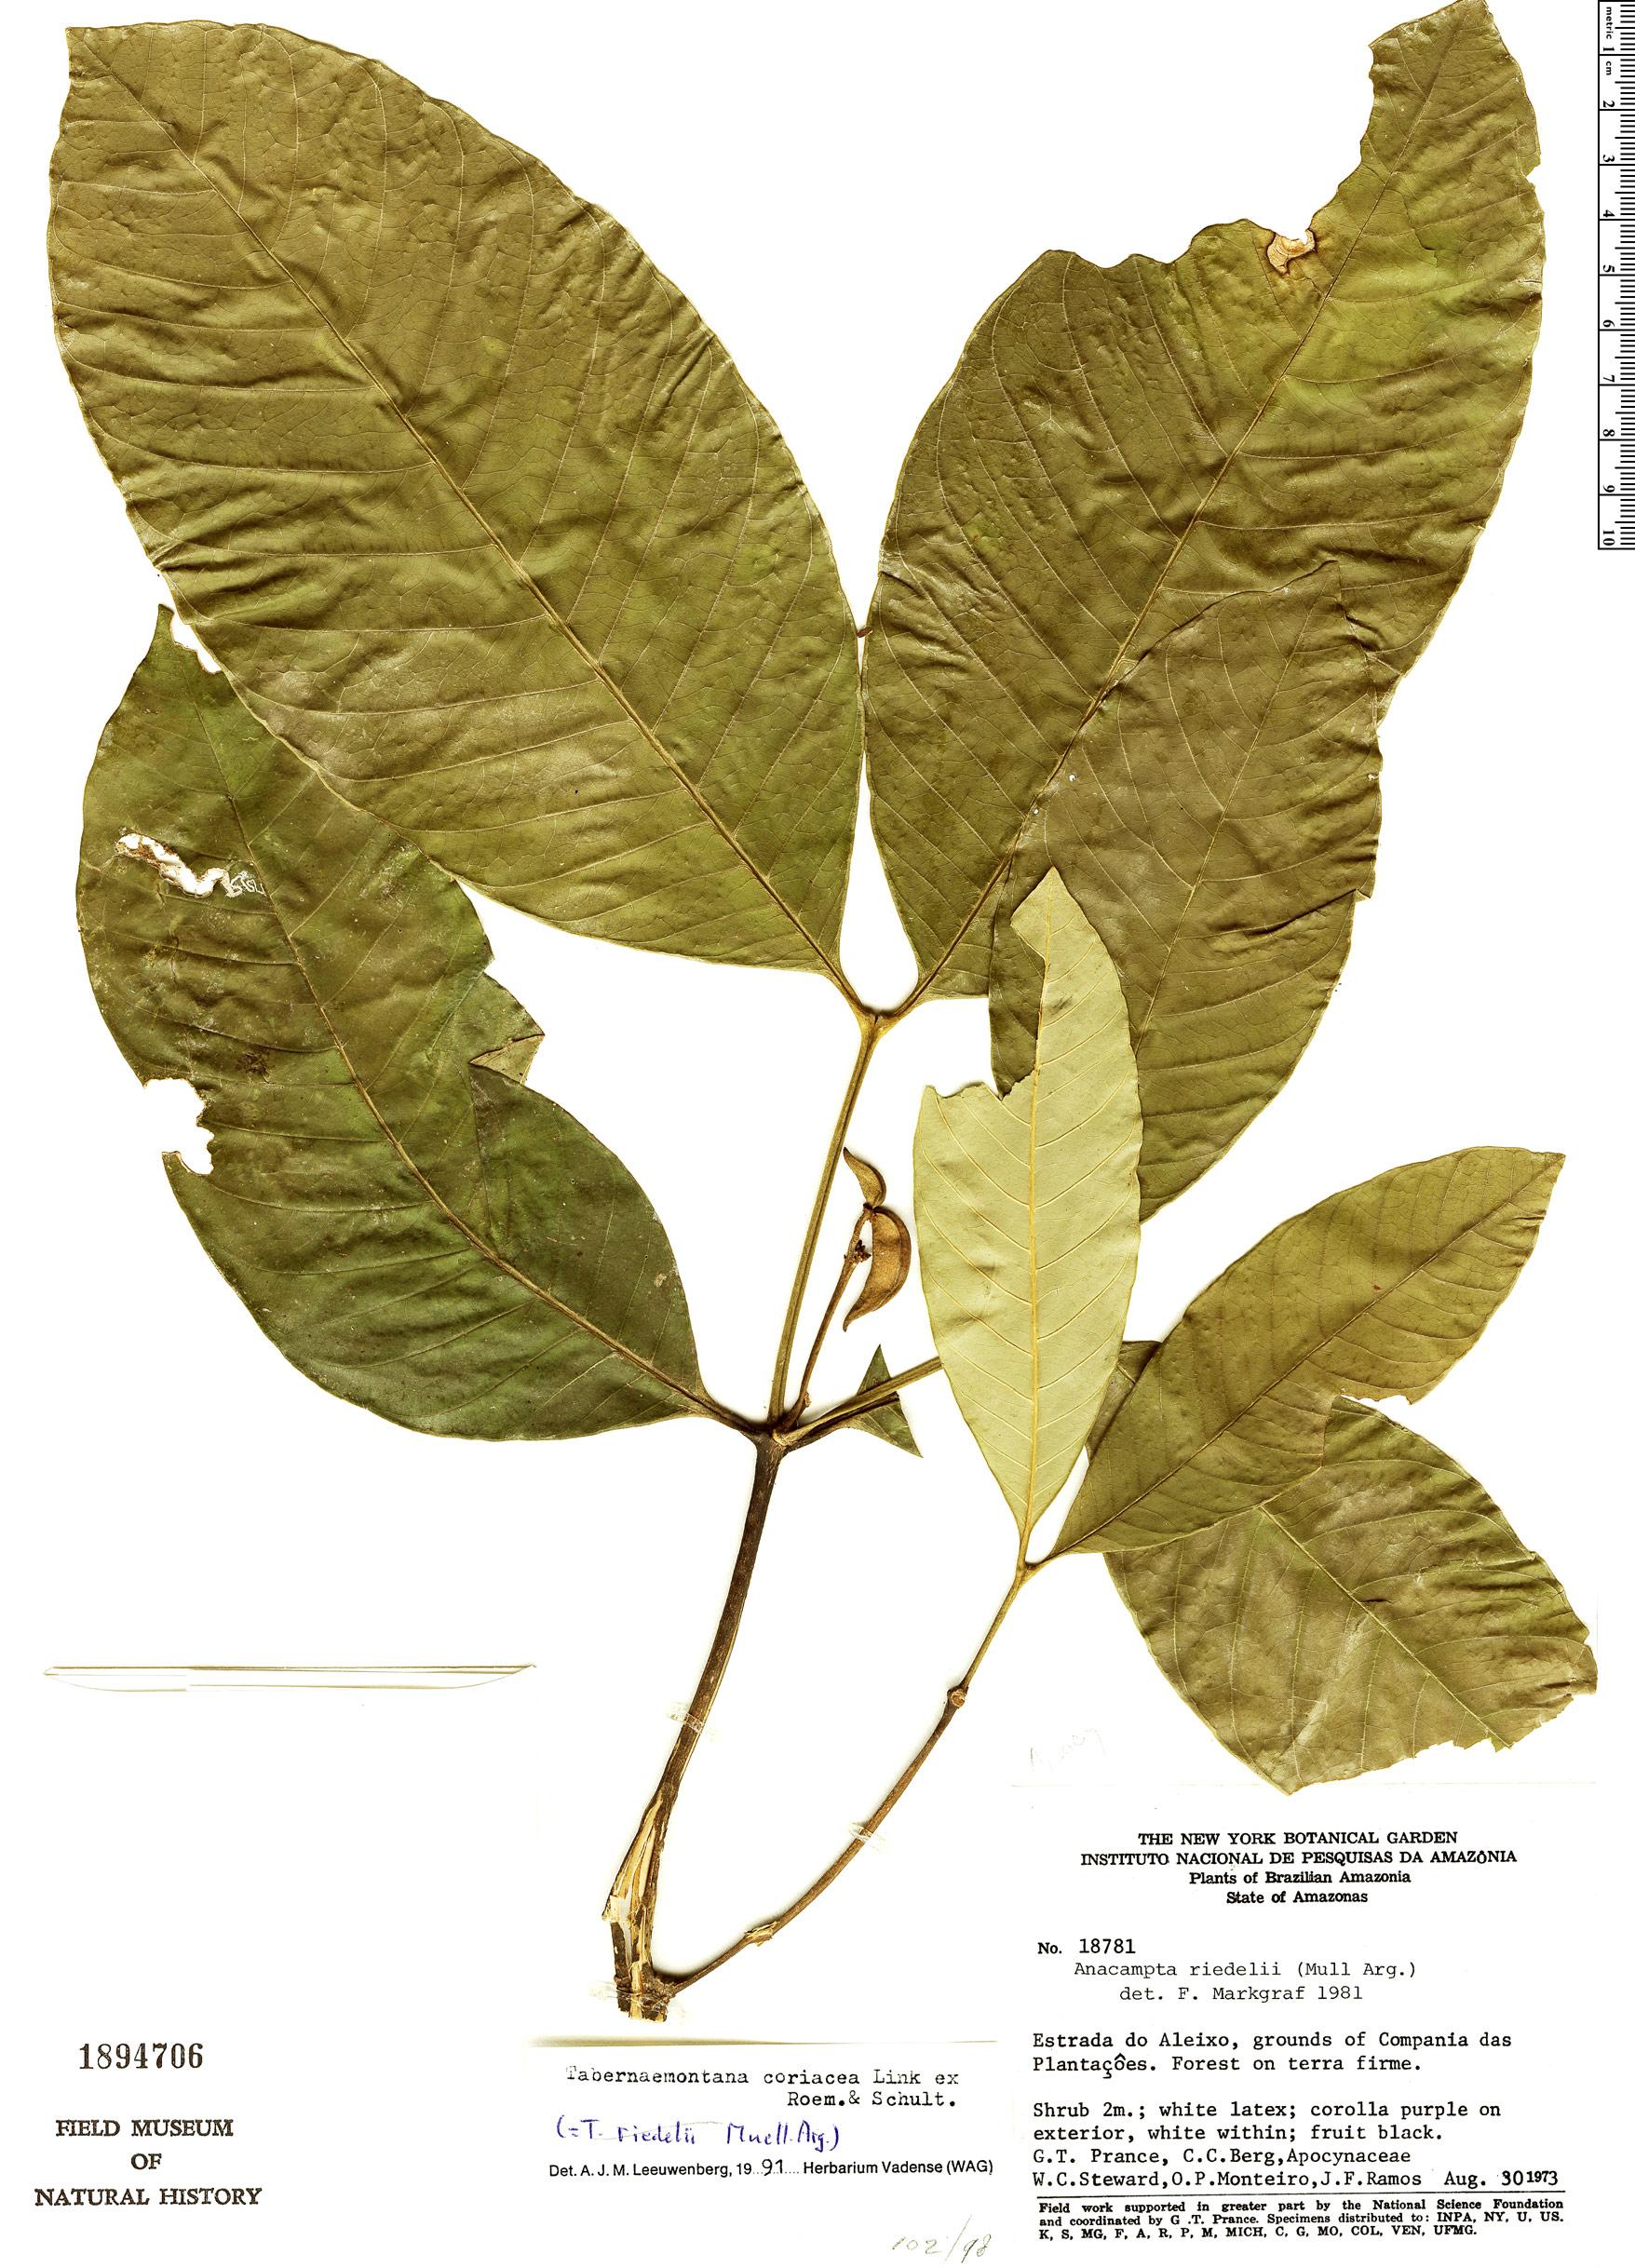 Specimen: Tabernaemontana coriacea